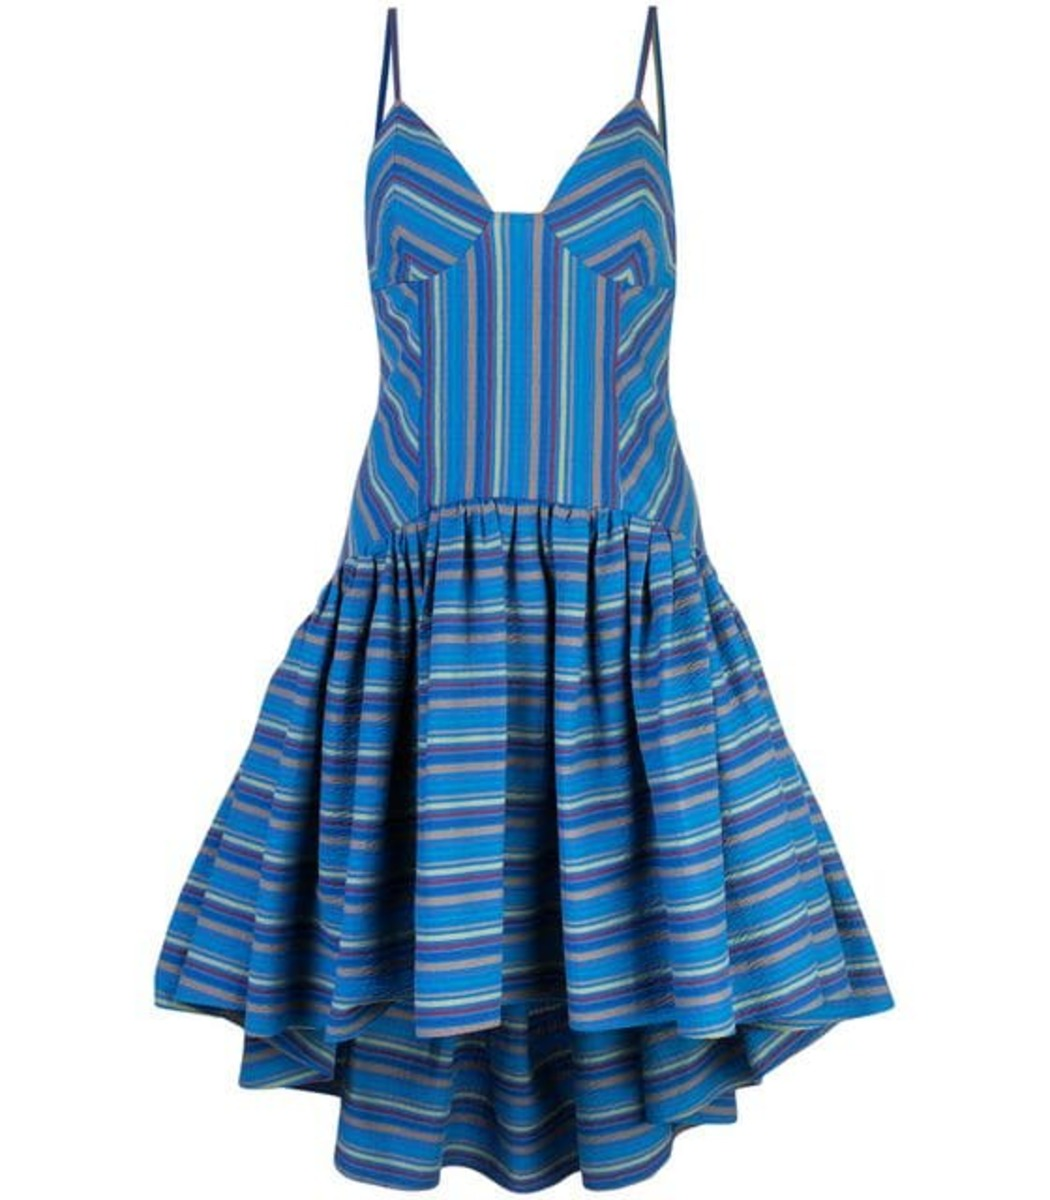 Rosie Assoulin Seersucker Striped High-Low Dress